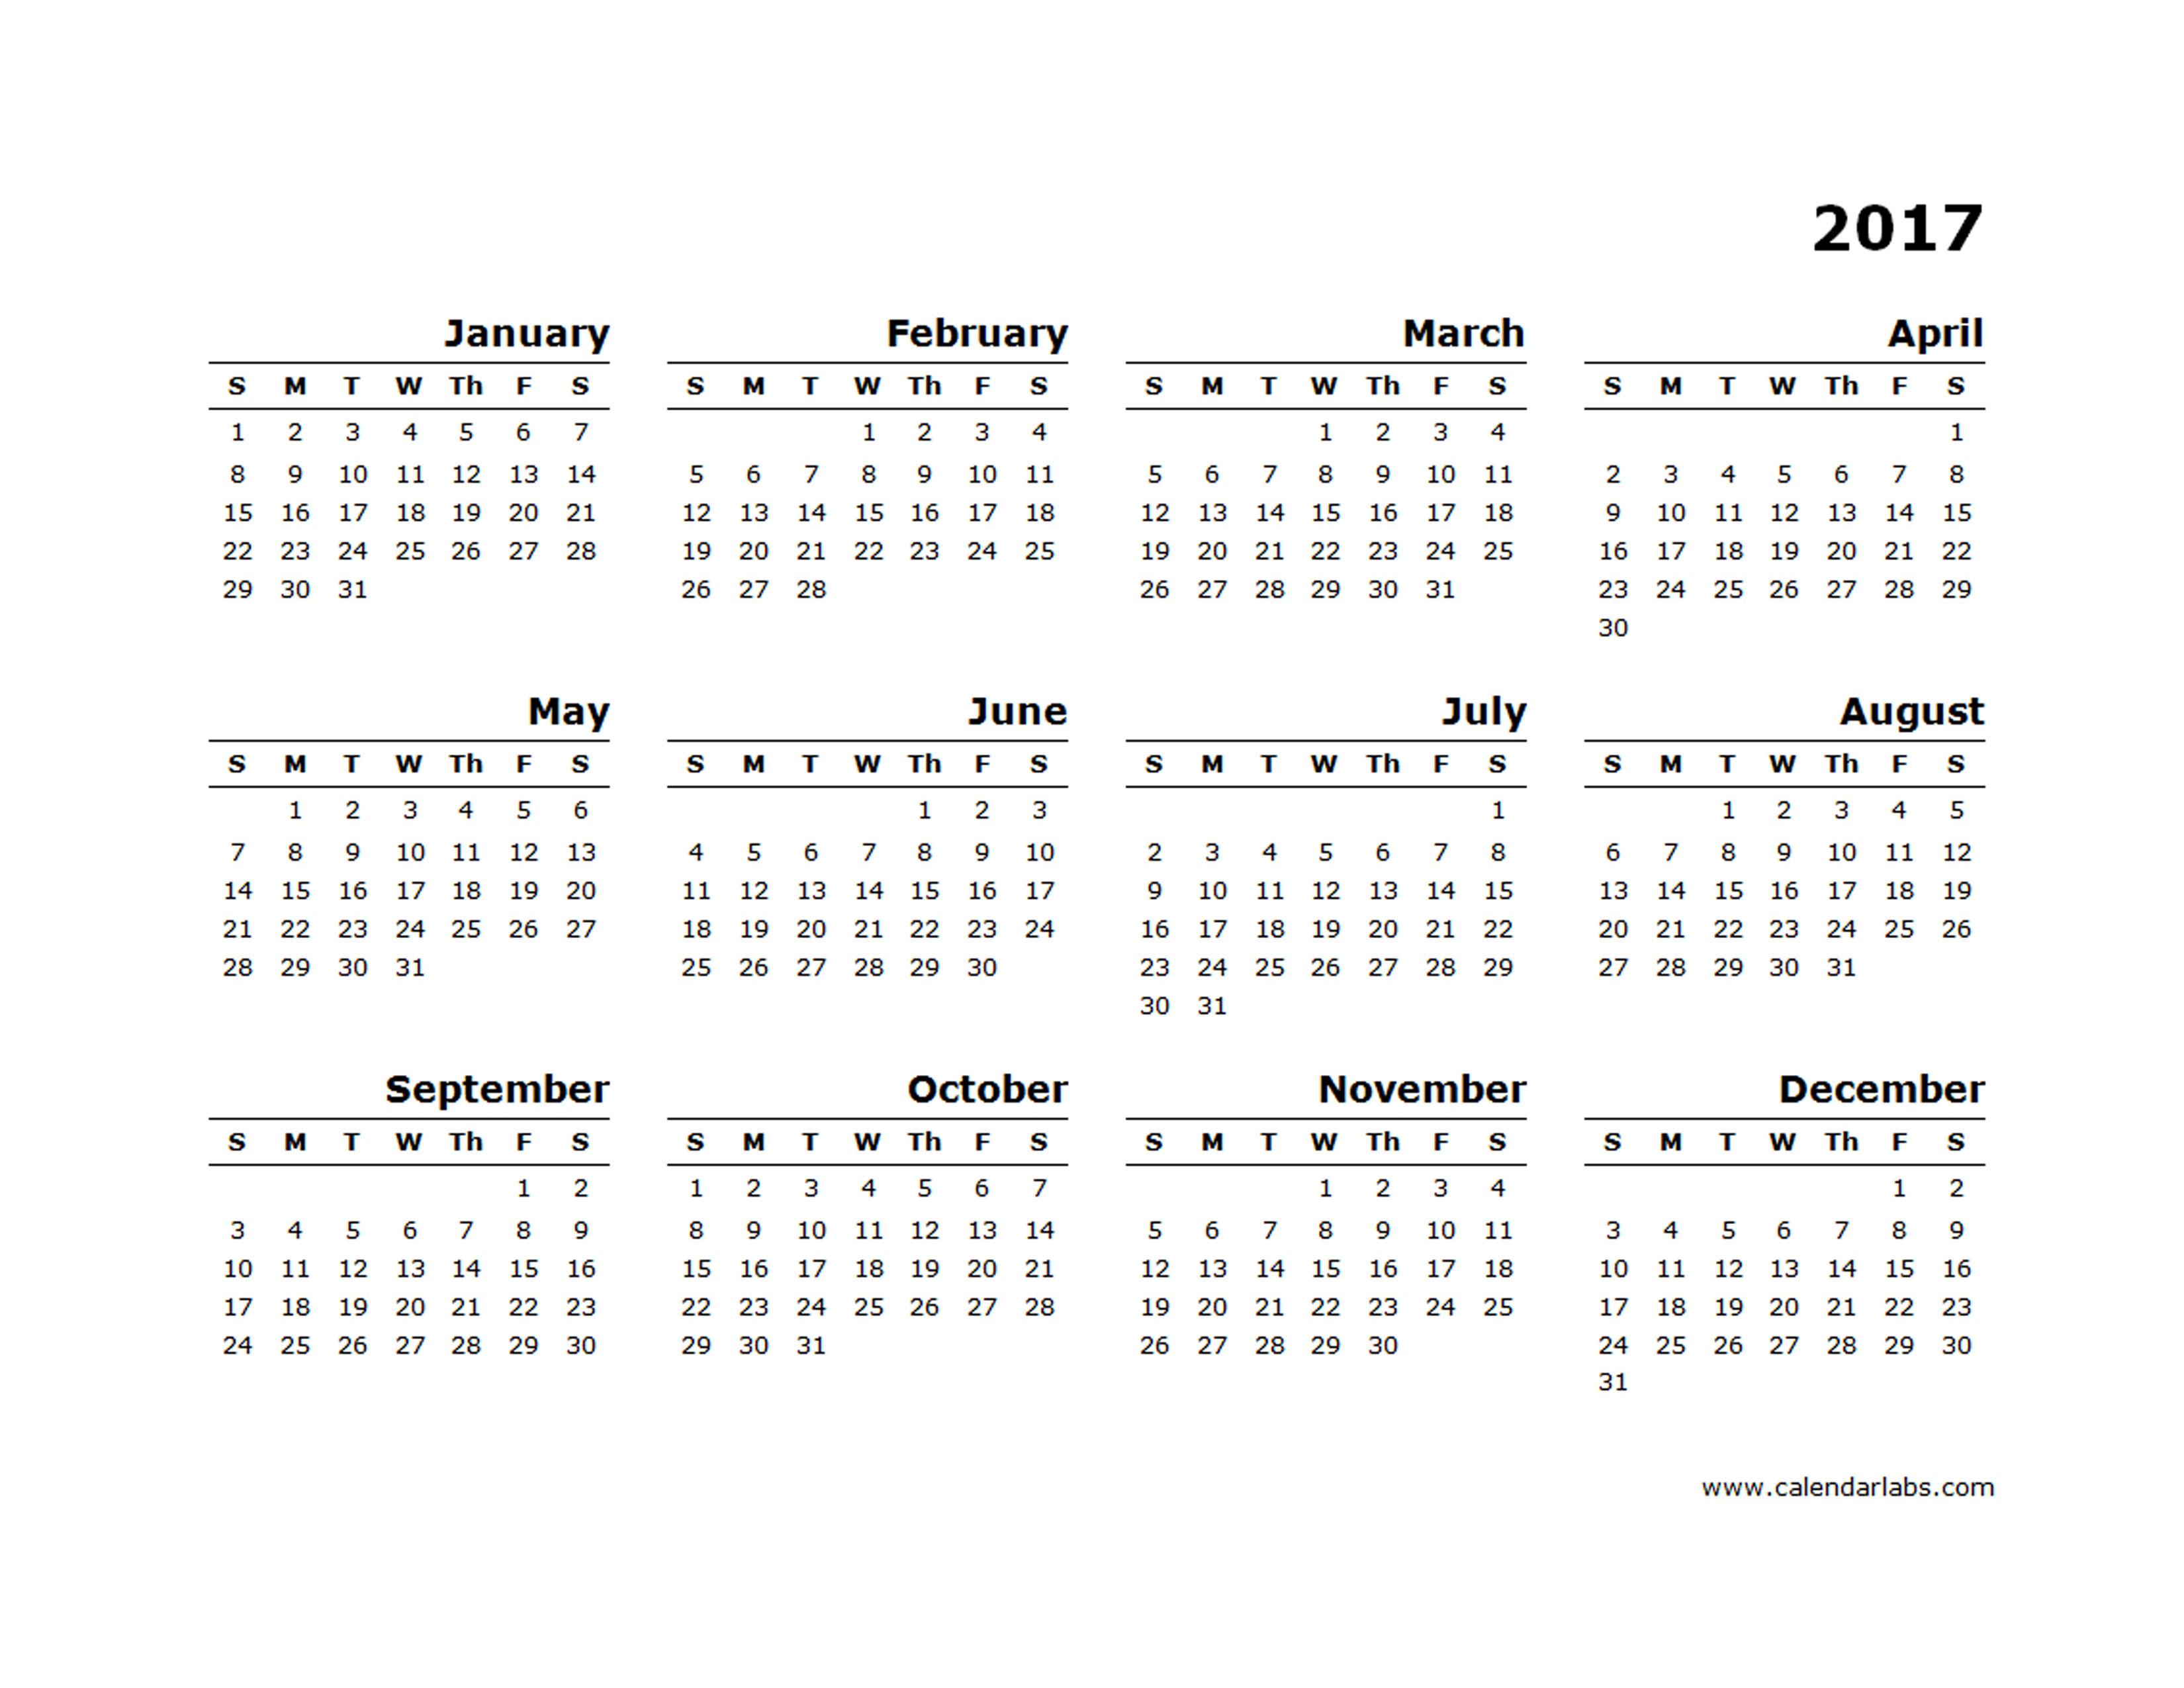 2017 Yearly Calendar Blank Minimal Design - Free Printable ...